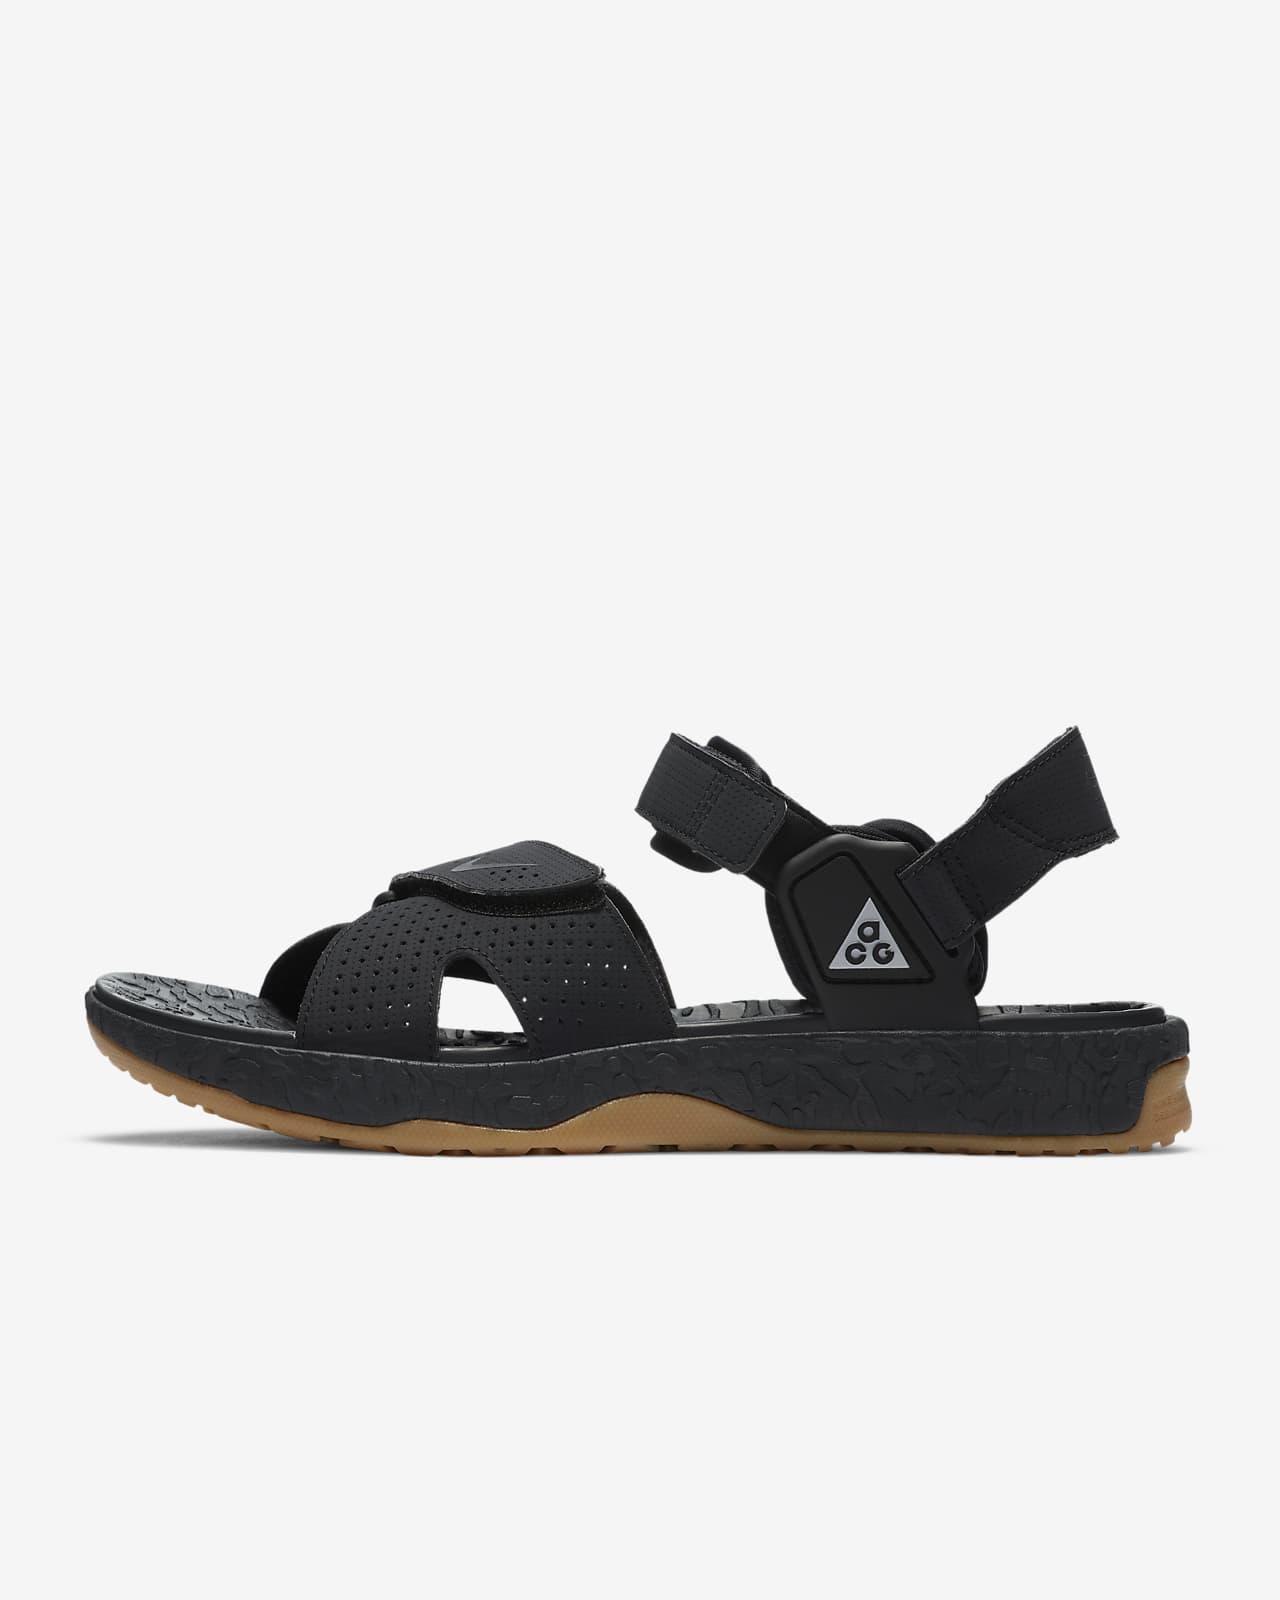 nike solarsoft sandal south africa